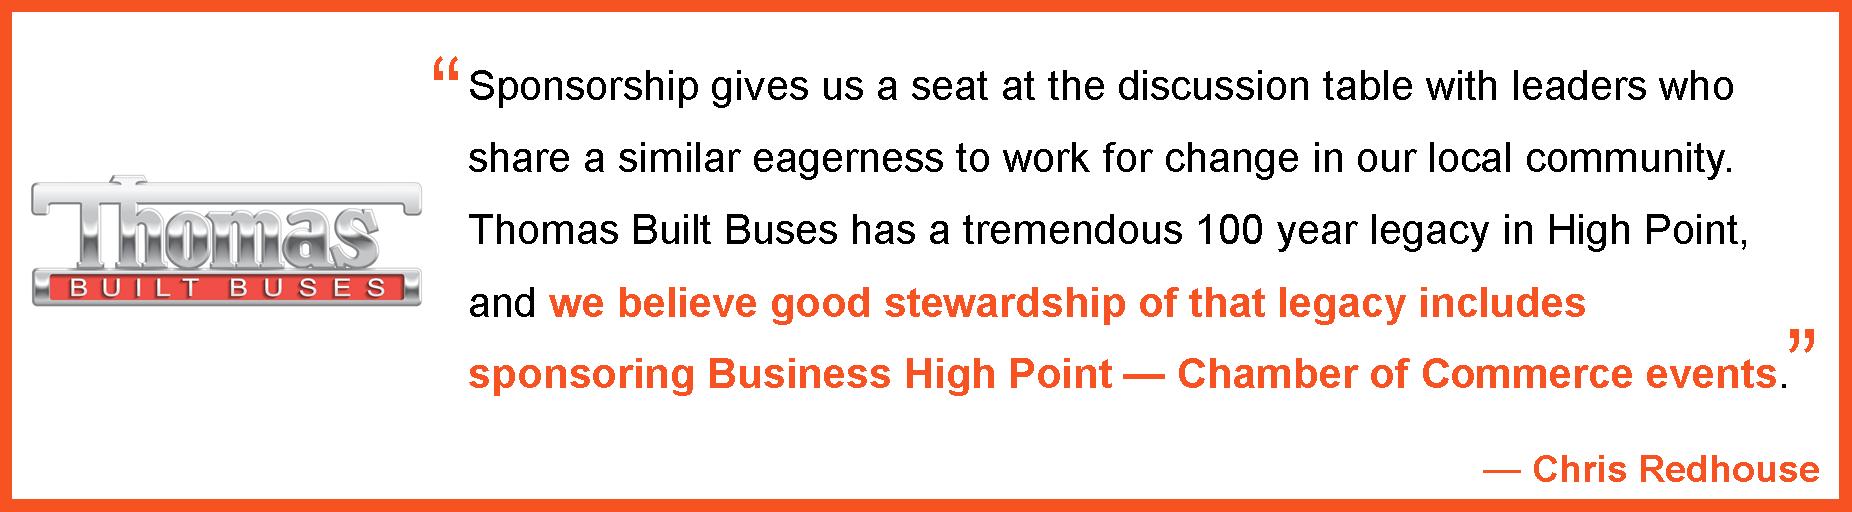 Sponsorship_Thomas-Built-Buses.png